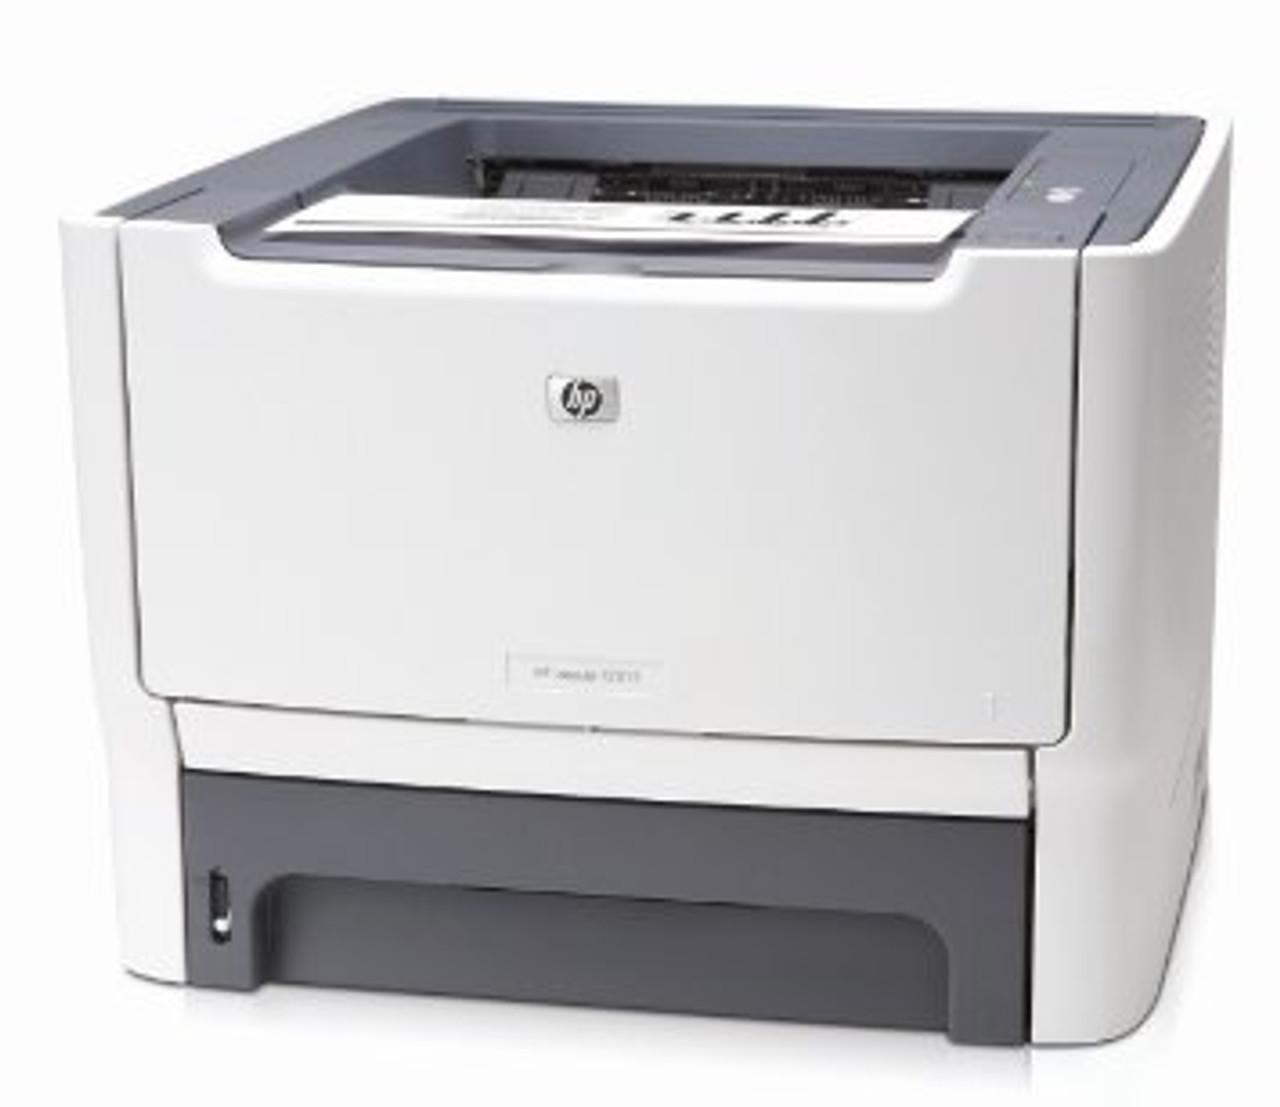 HP LaserJet P2015dn - CB368A - HP Laser Printer for sale